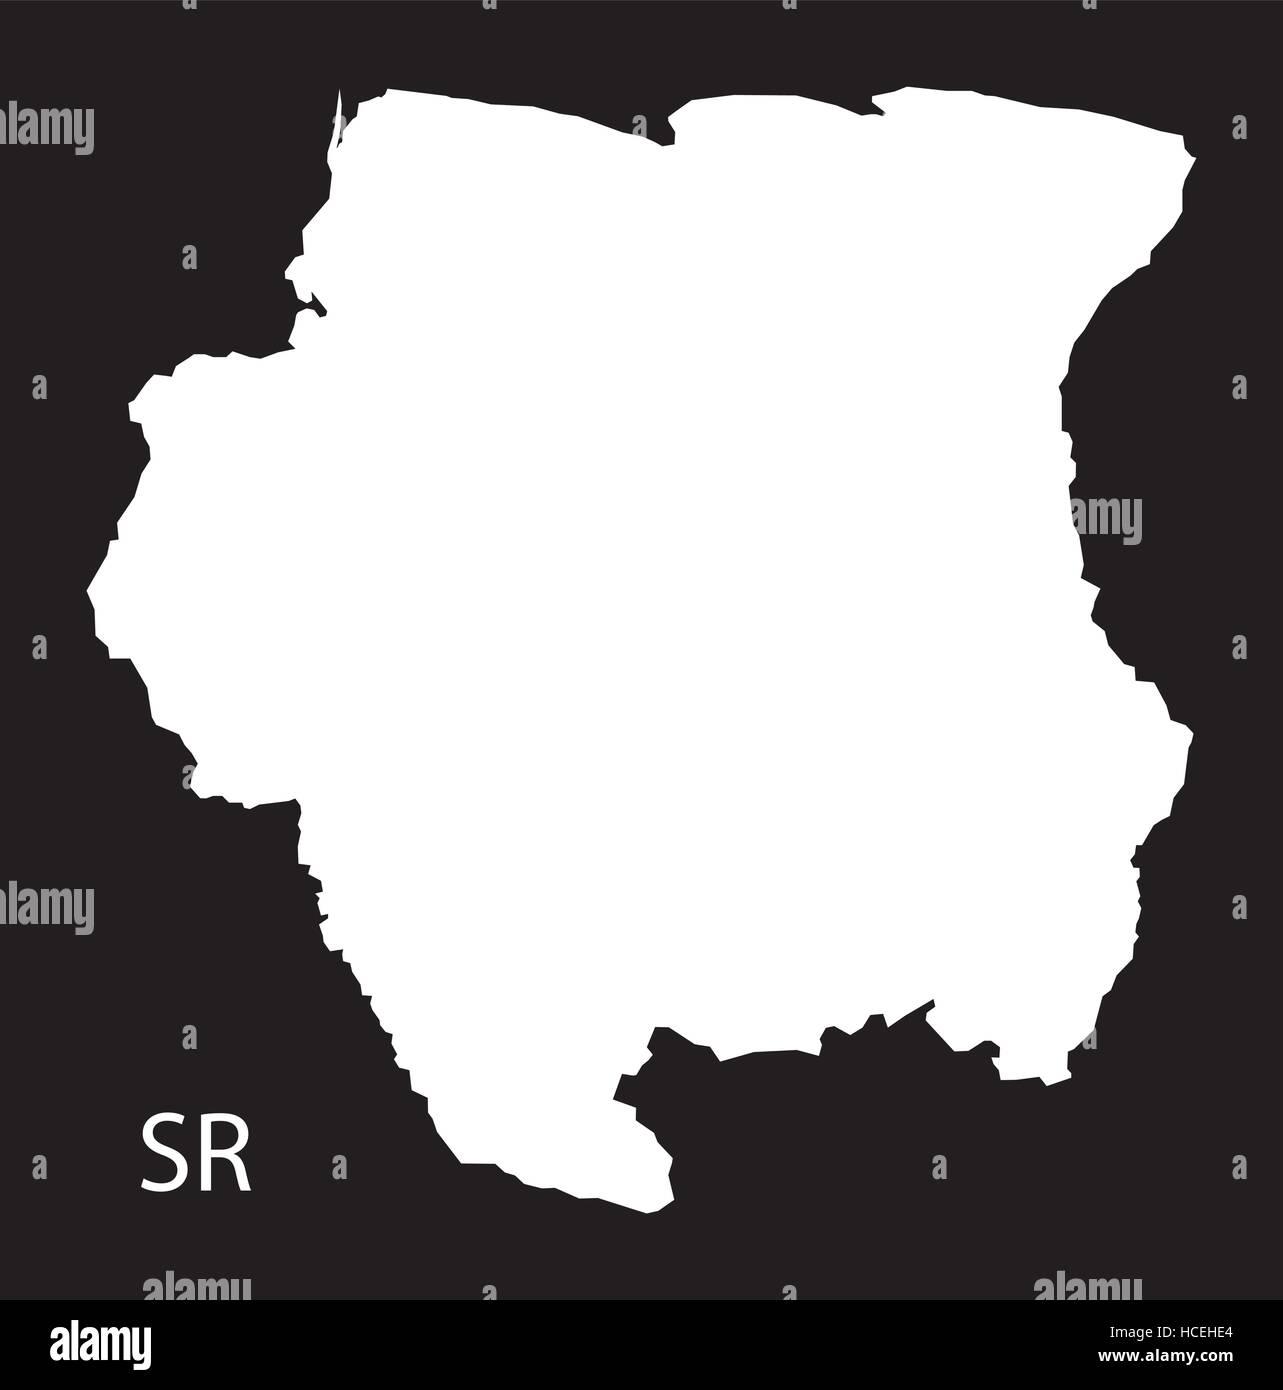 Suriname Map black illustration Stock Vector Art Illustration